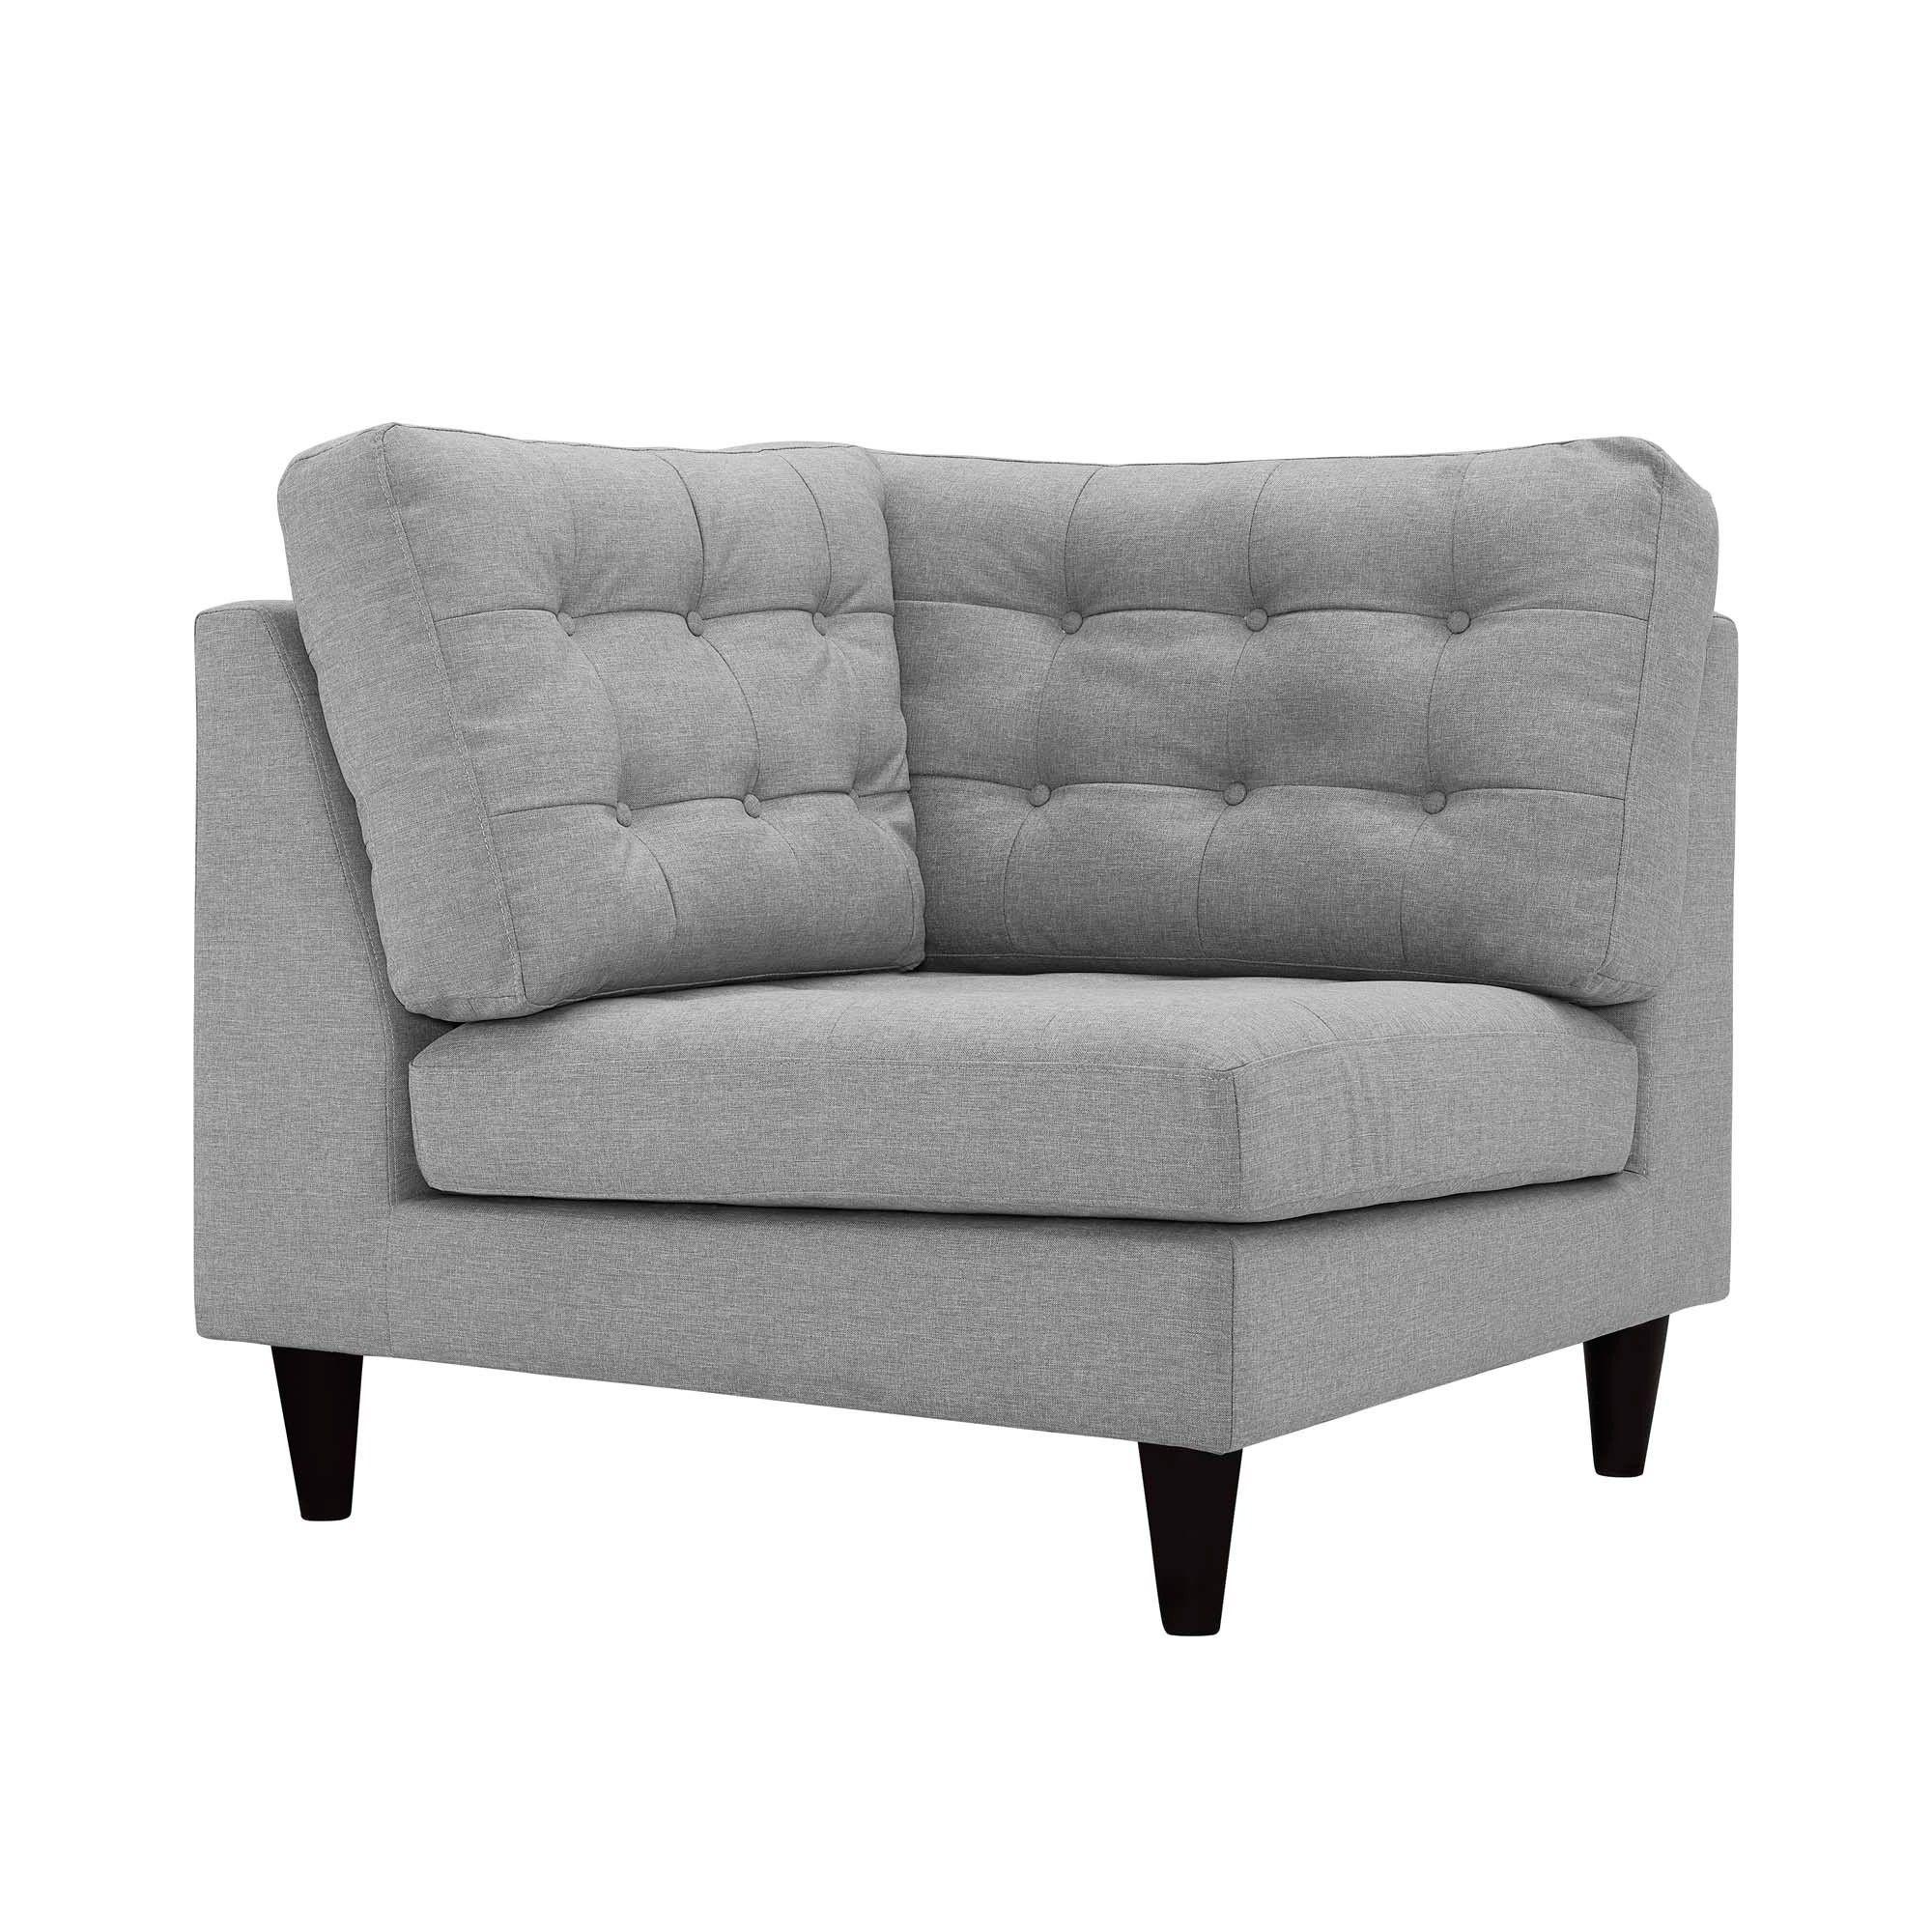 Empress Upholstered Fabric Corner Sofa Light Gray